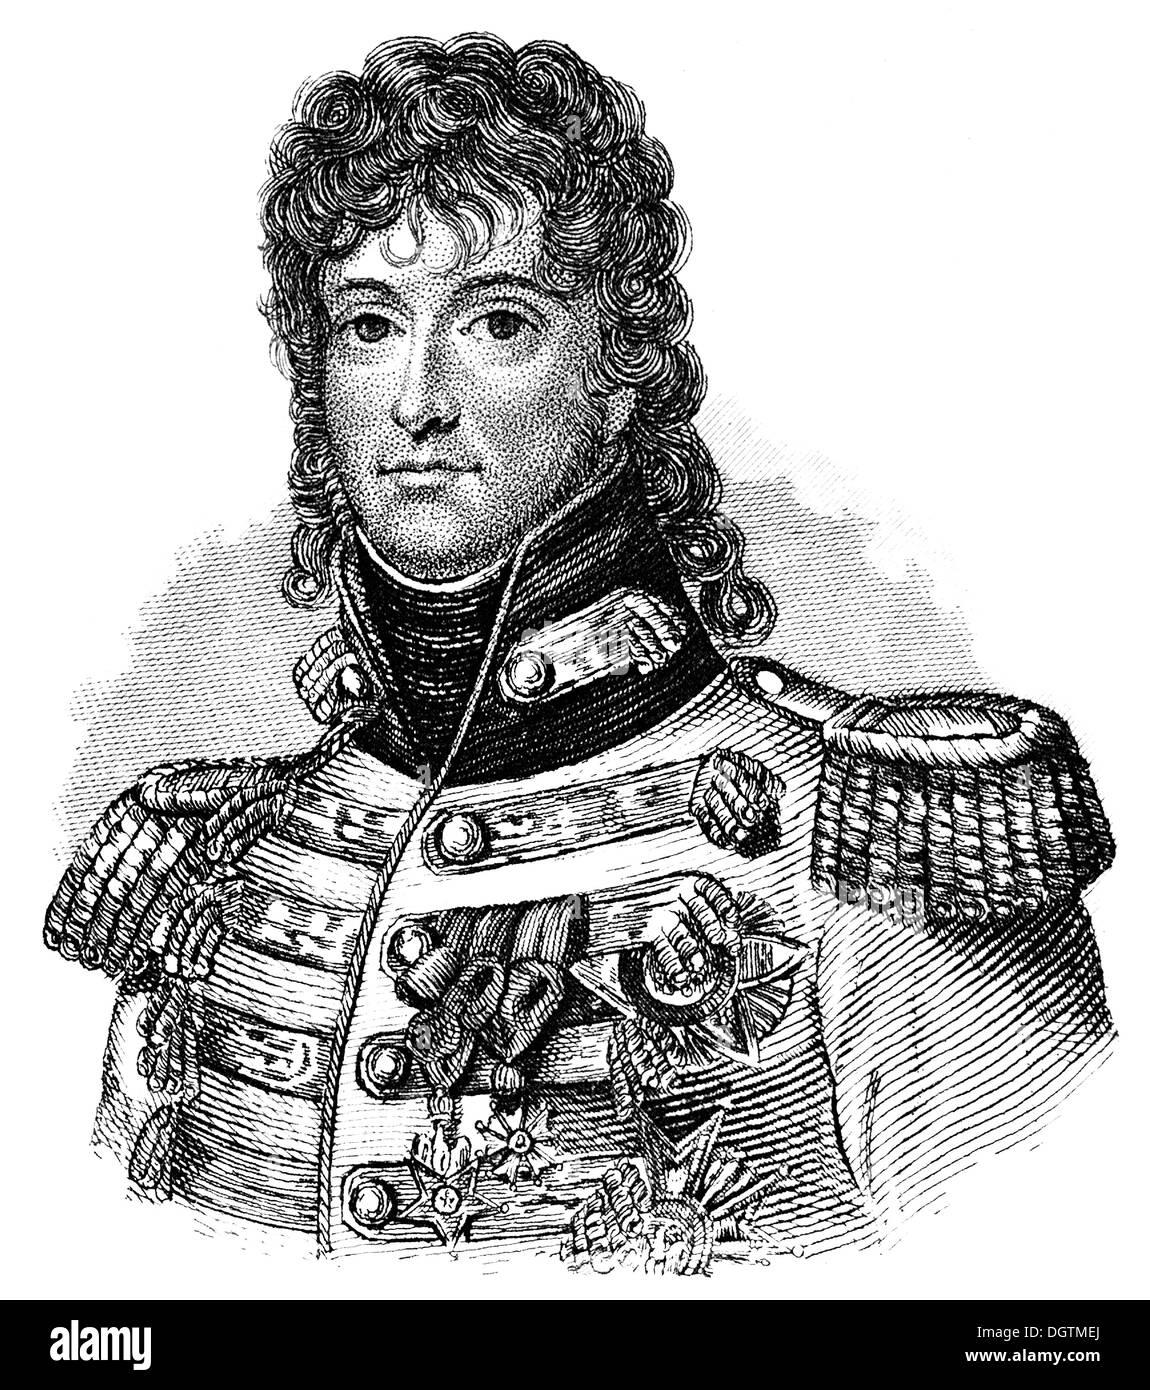 Joachim-Napoléon Murat, 1767-1815, Marshal of France, Admiral of France, King of Naples, - Stock Image